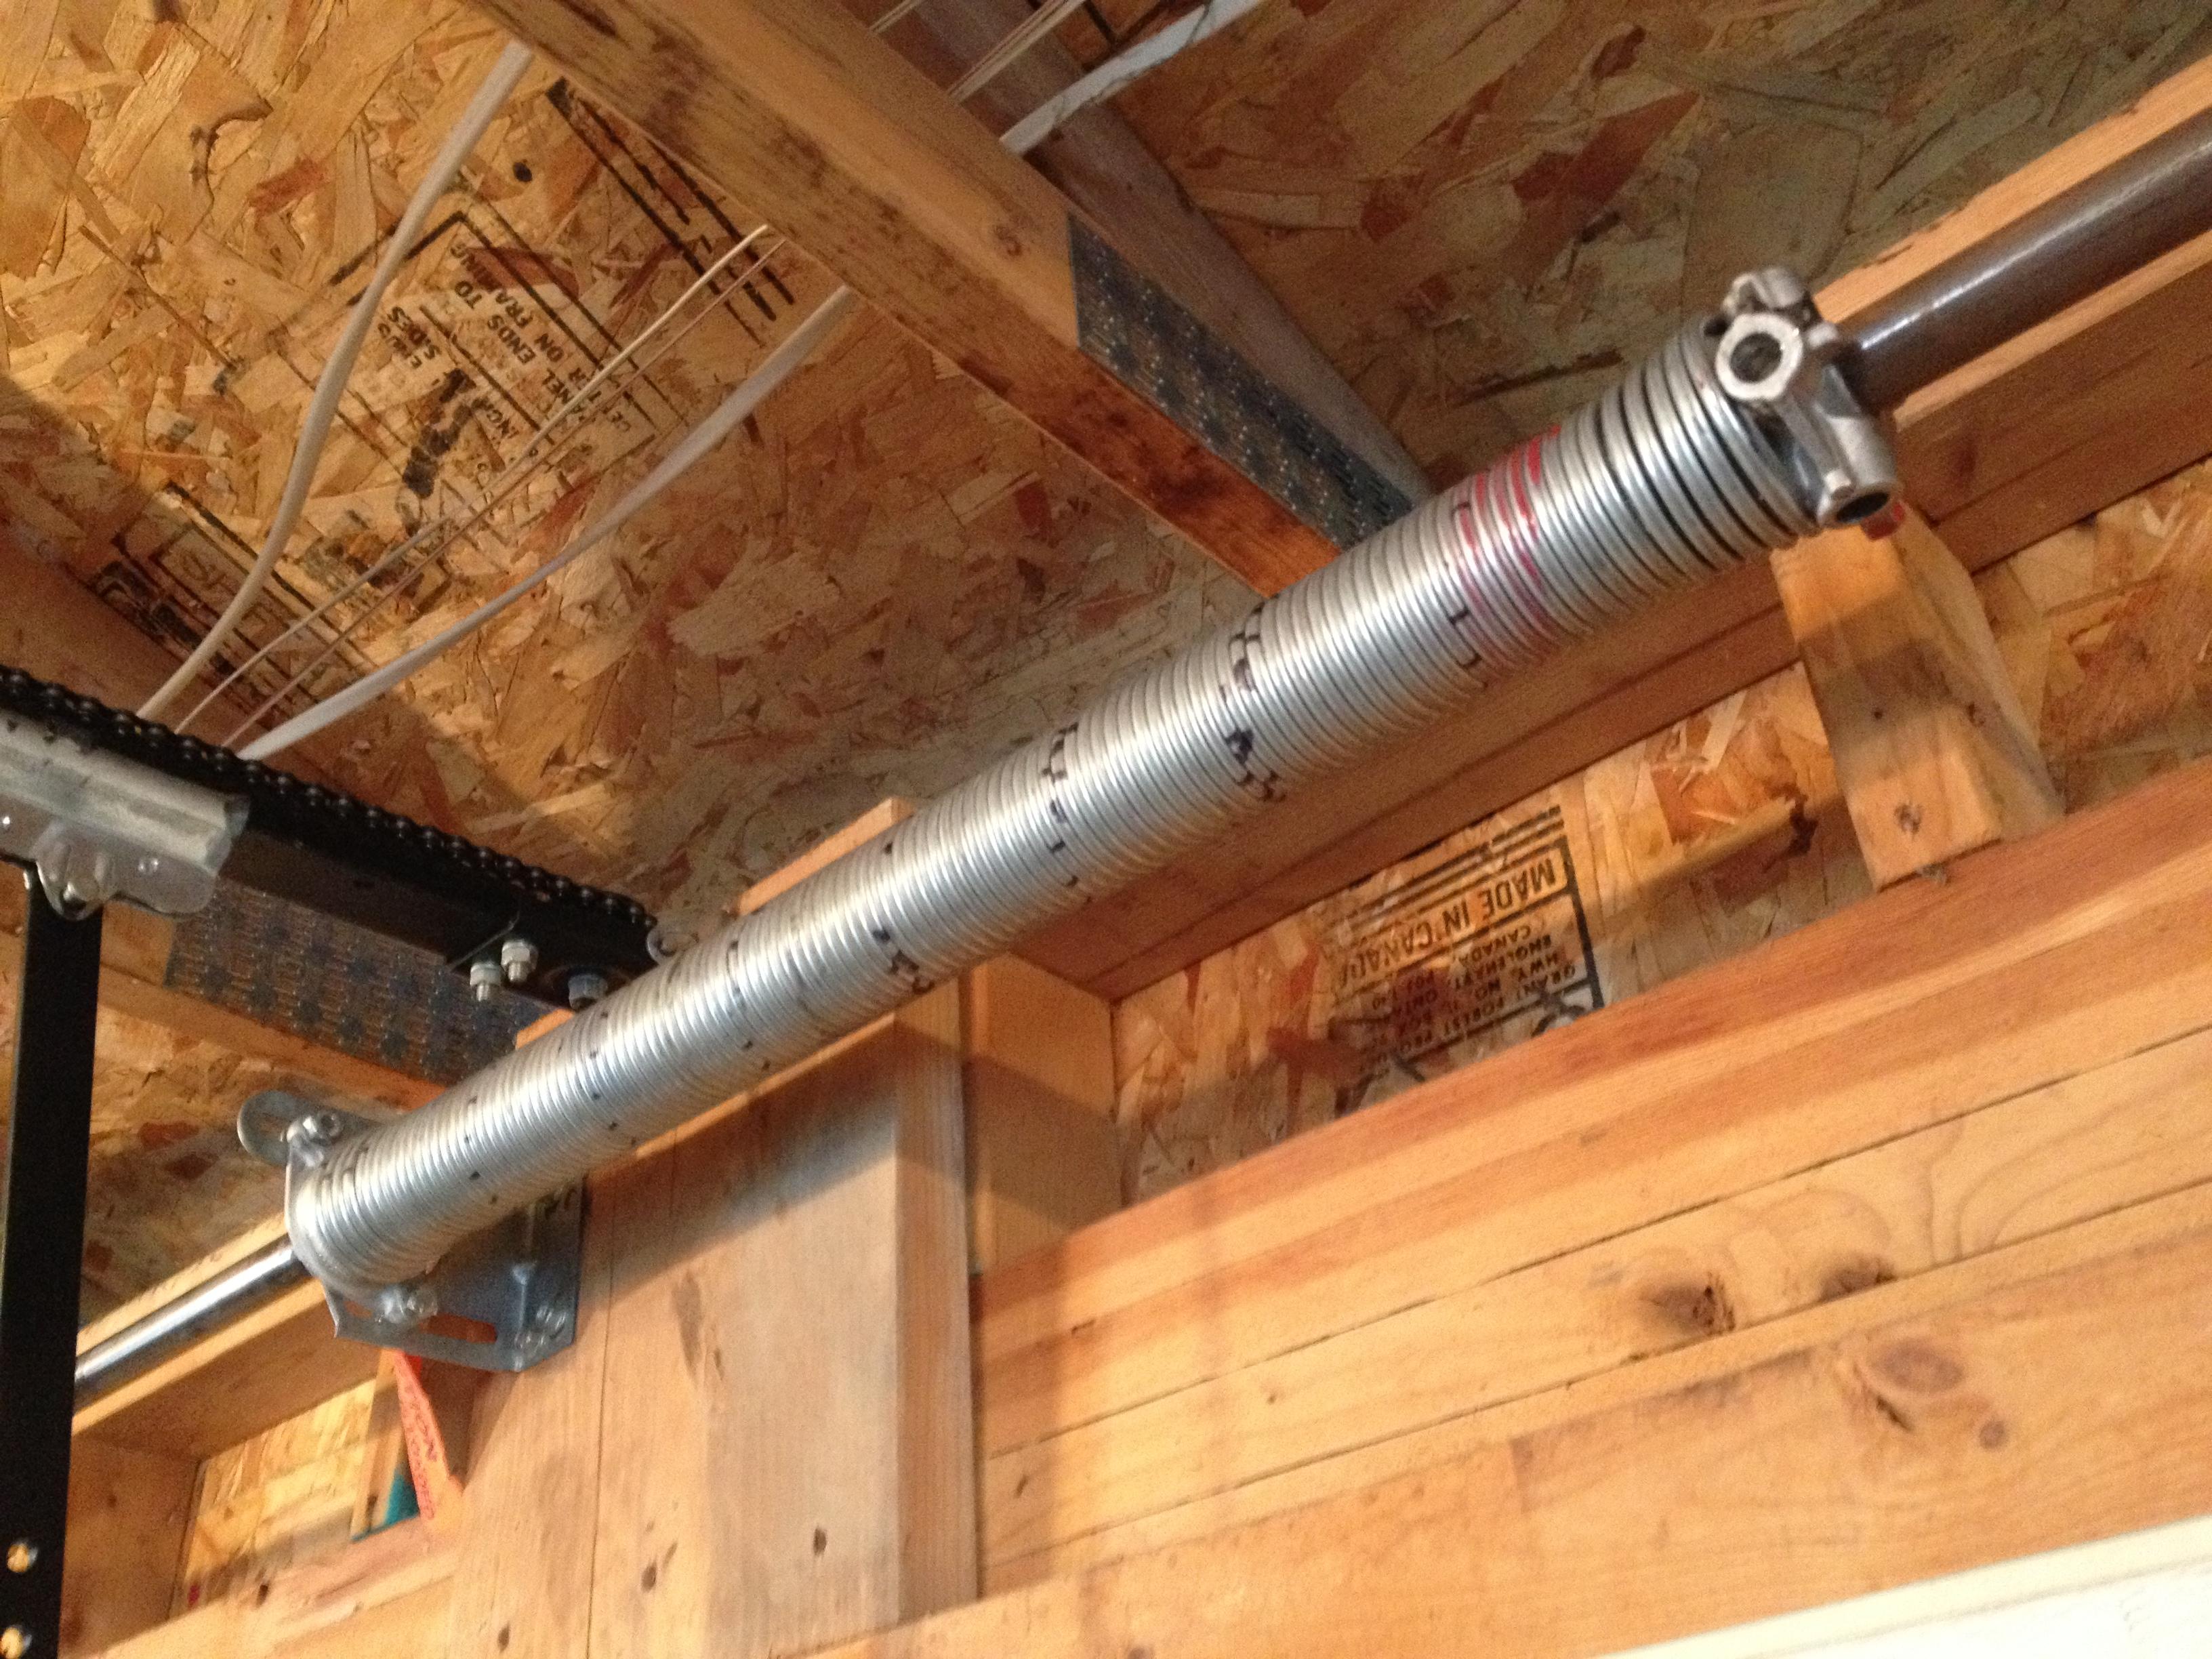 Garage door torsion springs bing images for Garage door torsion springs replacement cost